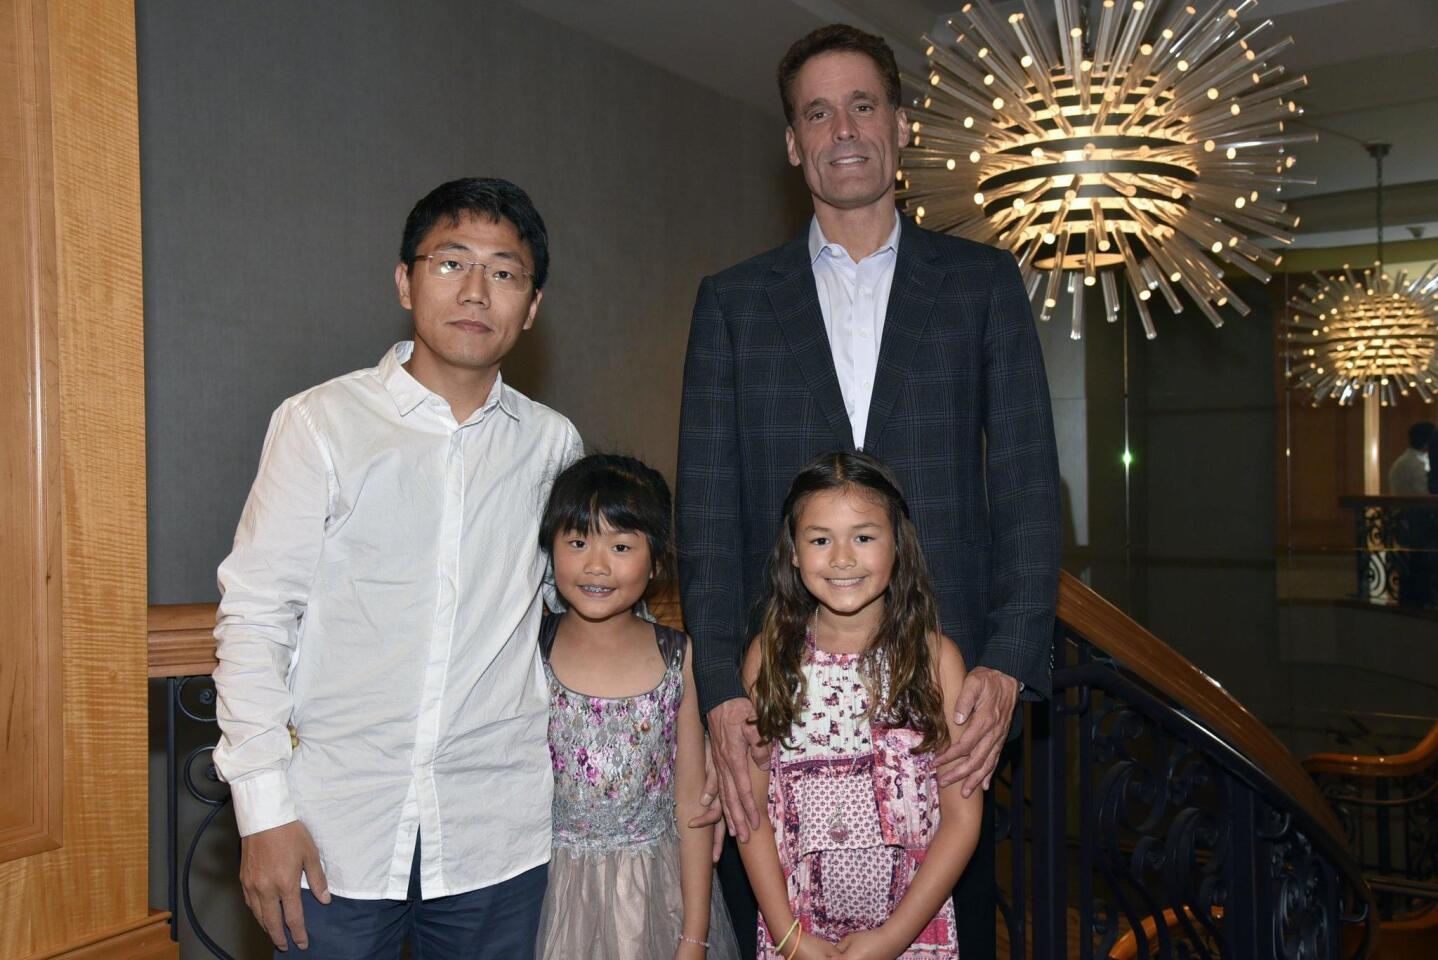 Jianle Chen with Jessie, Daniel Cramer with Laramie